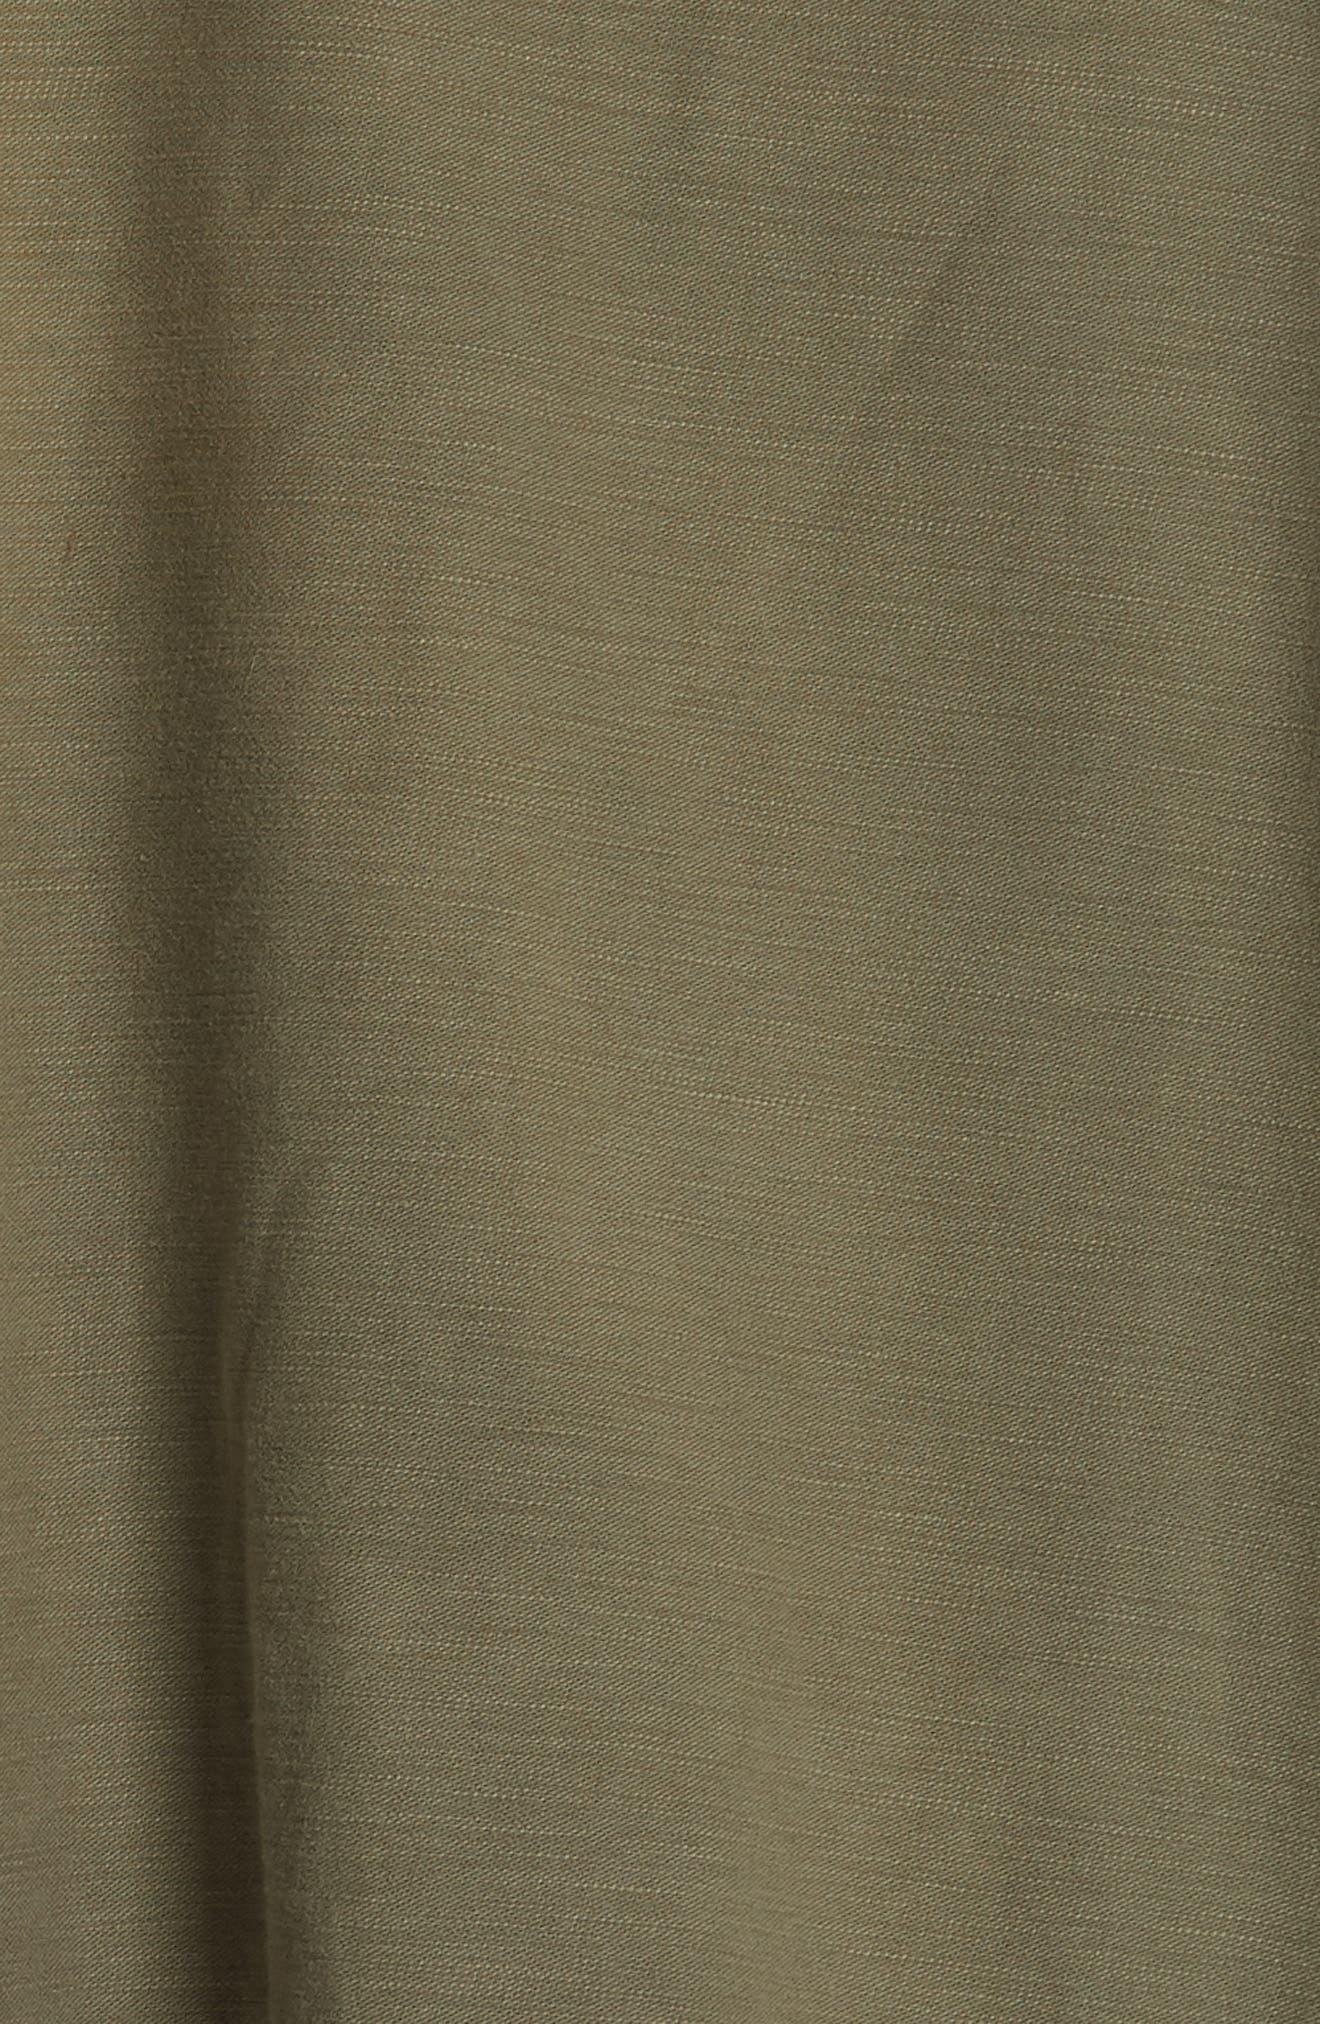 Abu Jacket with Long Leopard Print Hoodie,                             Alternate thumbnail 7, color,                             OLIVE/ ORANGE